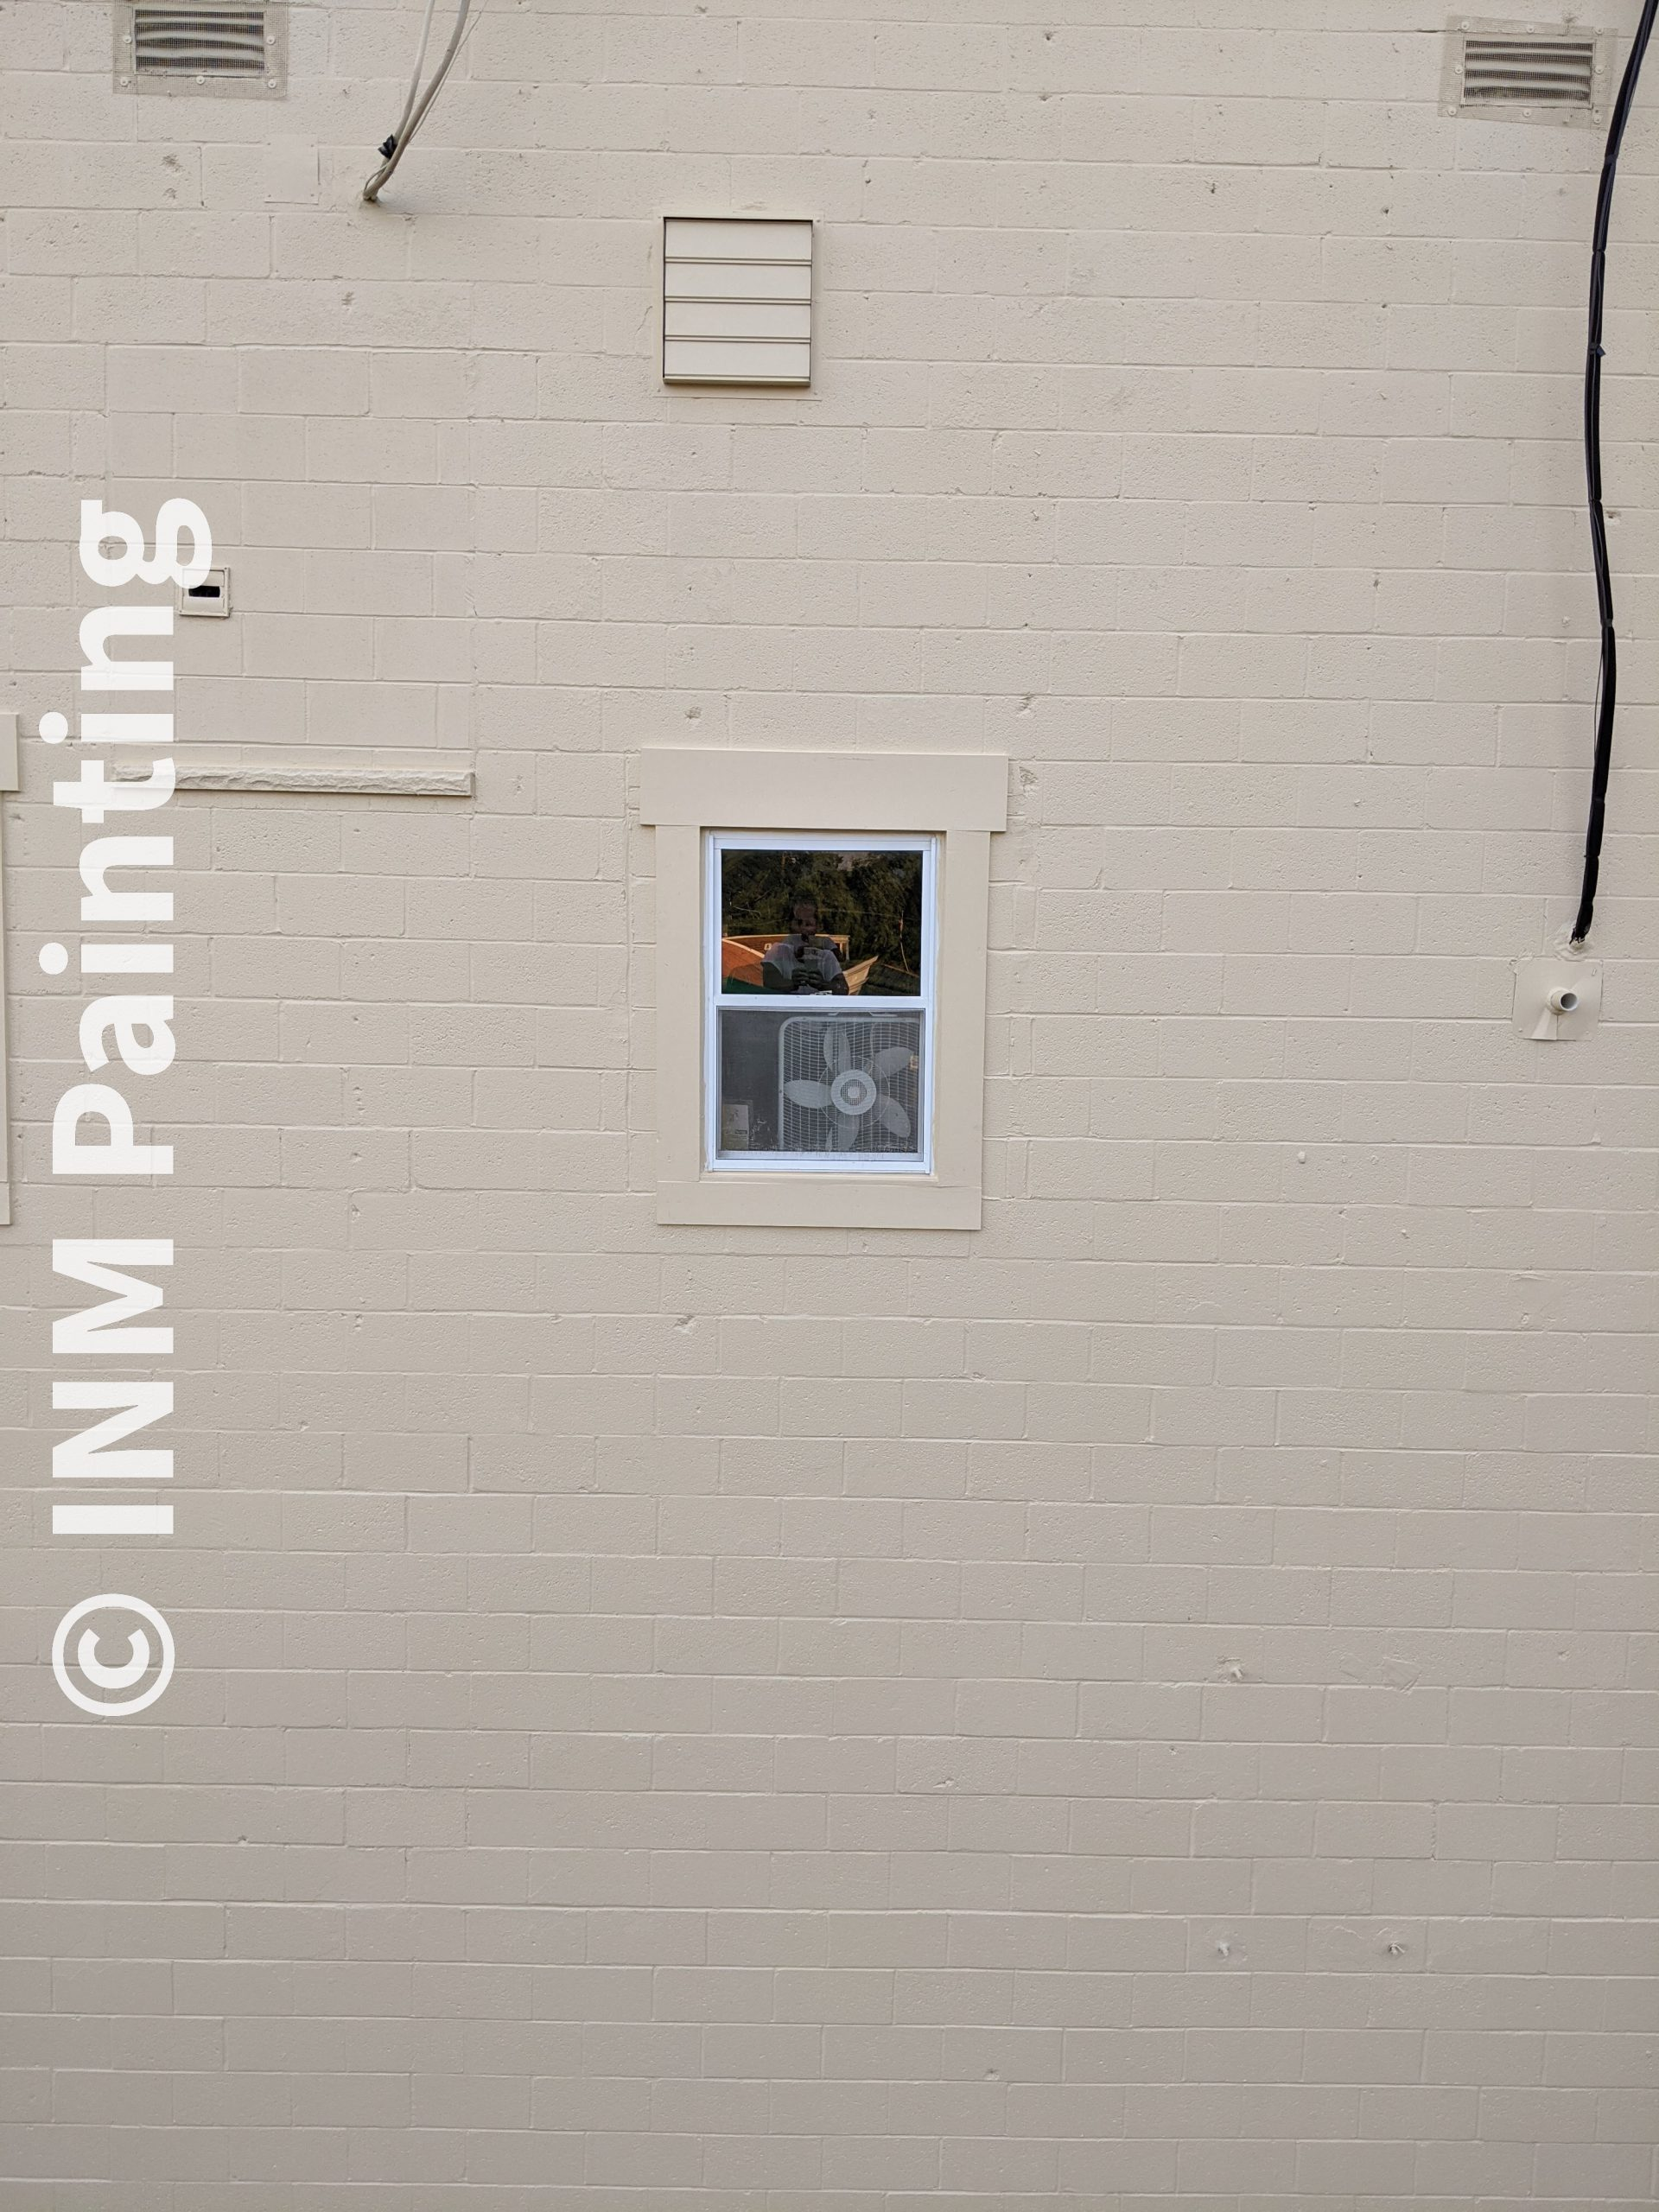 INM Painting - Lewiston, NY